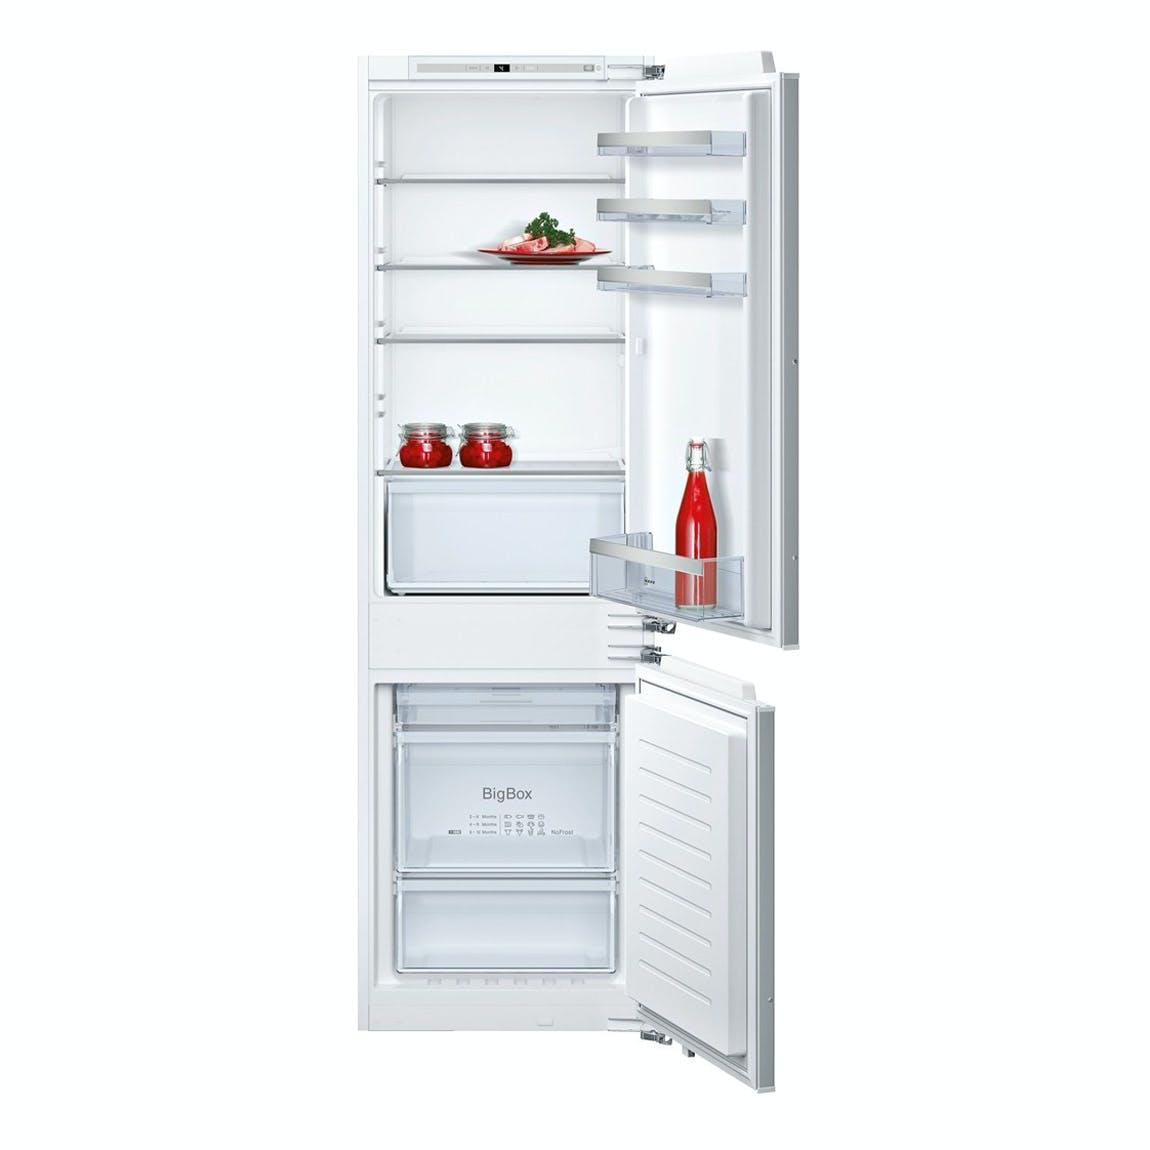 Neff Ki7862f30g Built In 60 40 No Frost Fridge Freezer 1